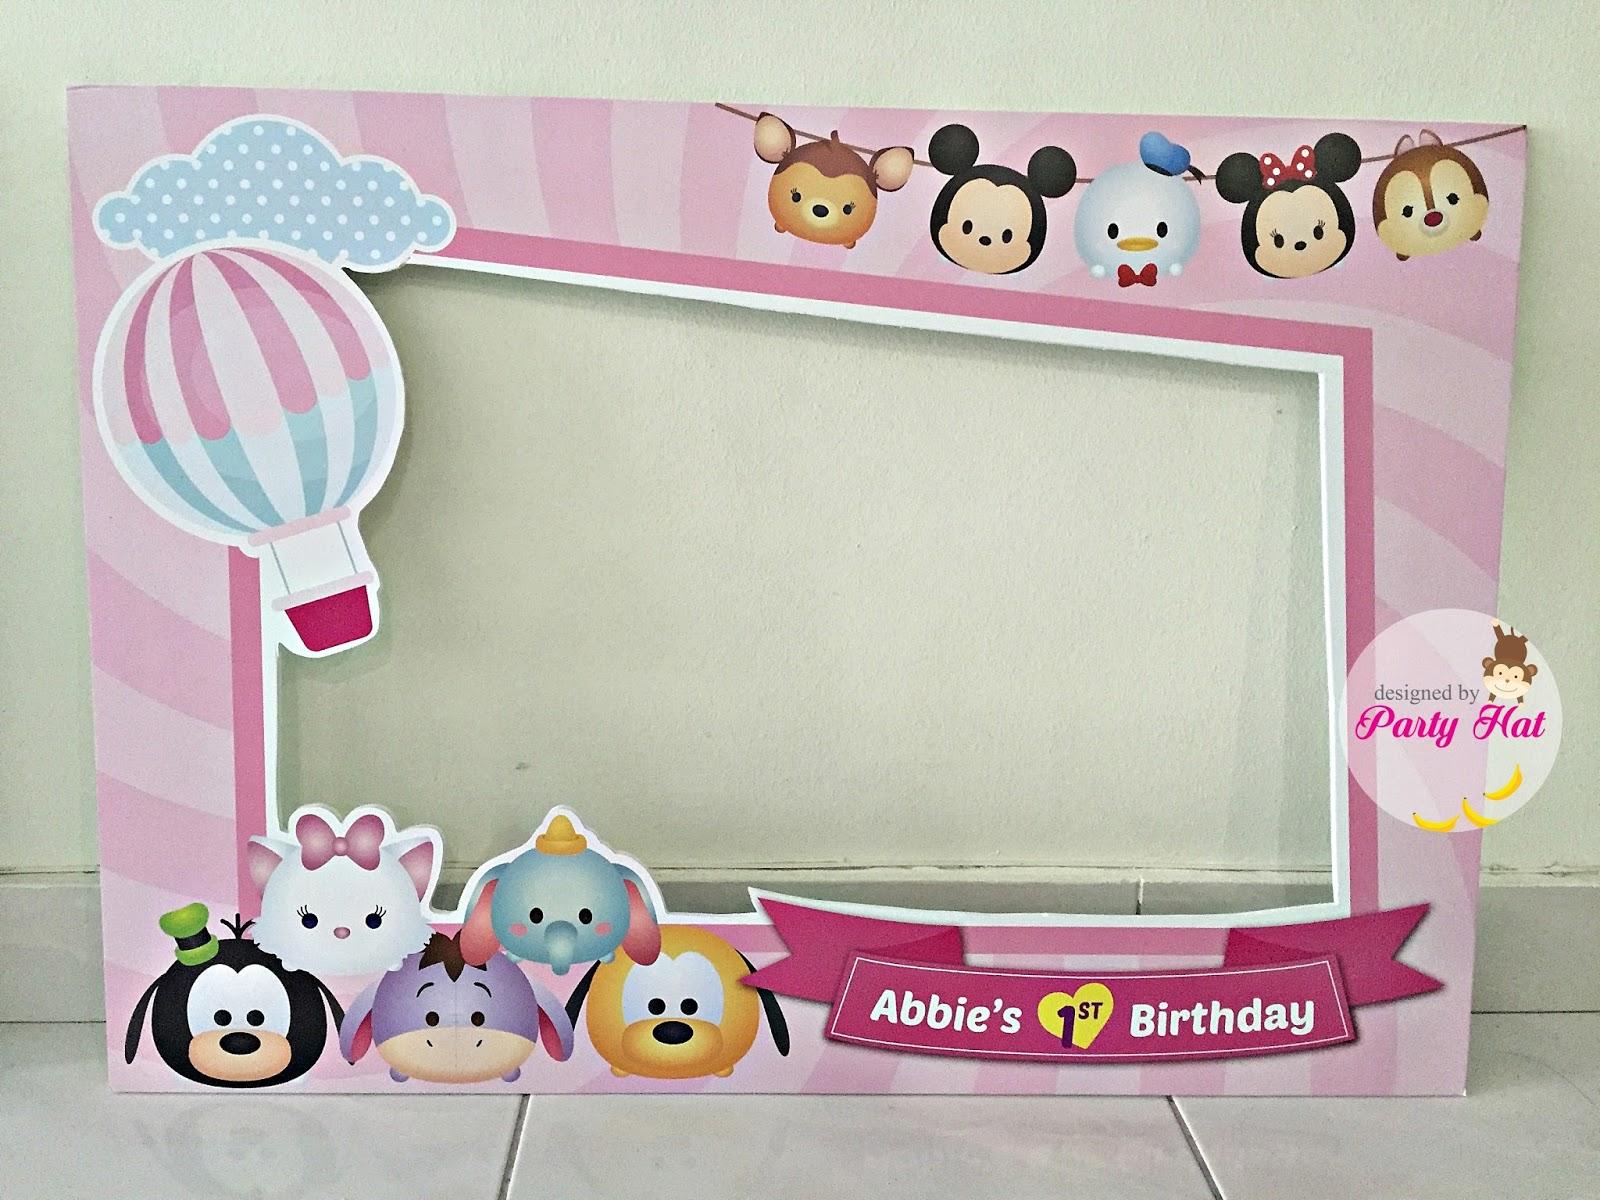 Party Hat: Abbie 's Disney Tsum Tsum Birthday Party